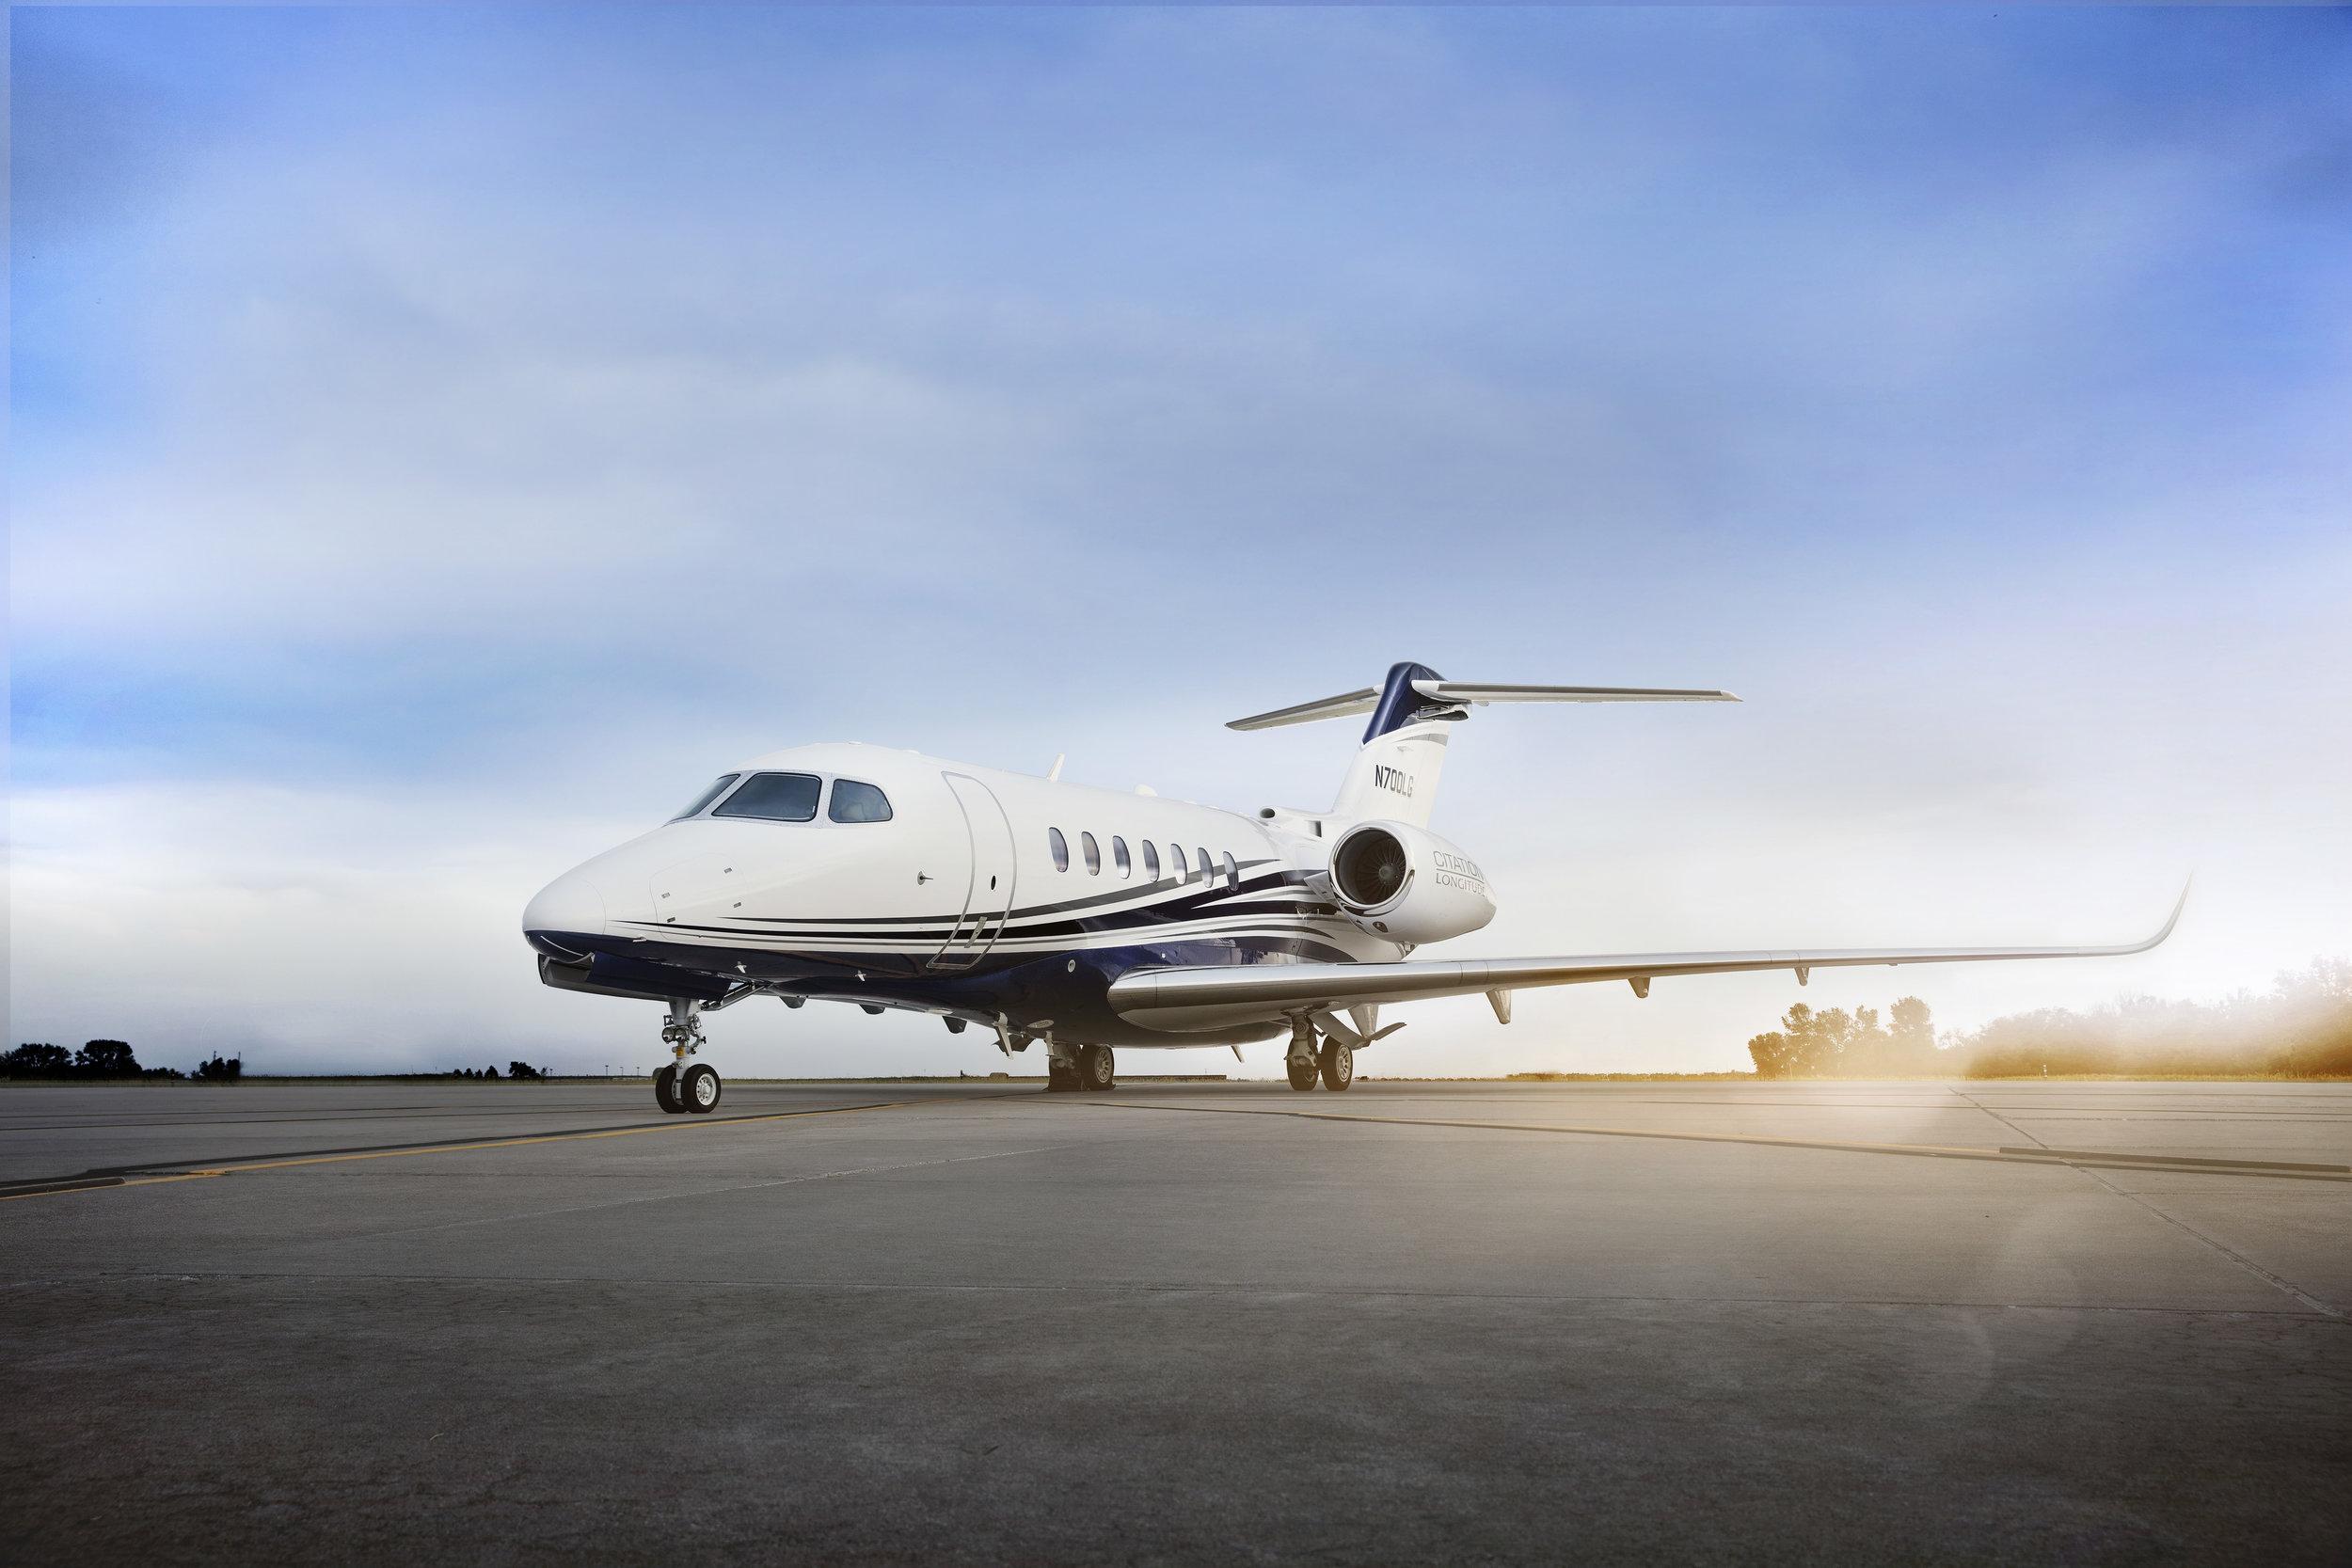 Citation_CJ3_Exterior_Light-Jet_Legacy_Aviation_Private_Jet_NetJets_jet_charter_TEB_VNY_MIA_PBI_FRG_SFO_FLL_FXE_BED.jpg